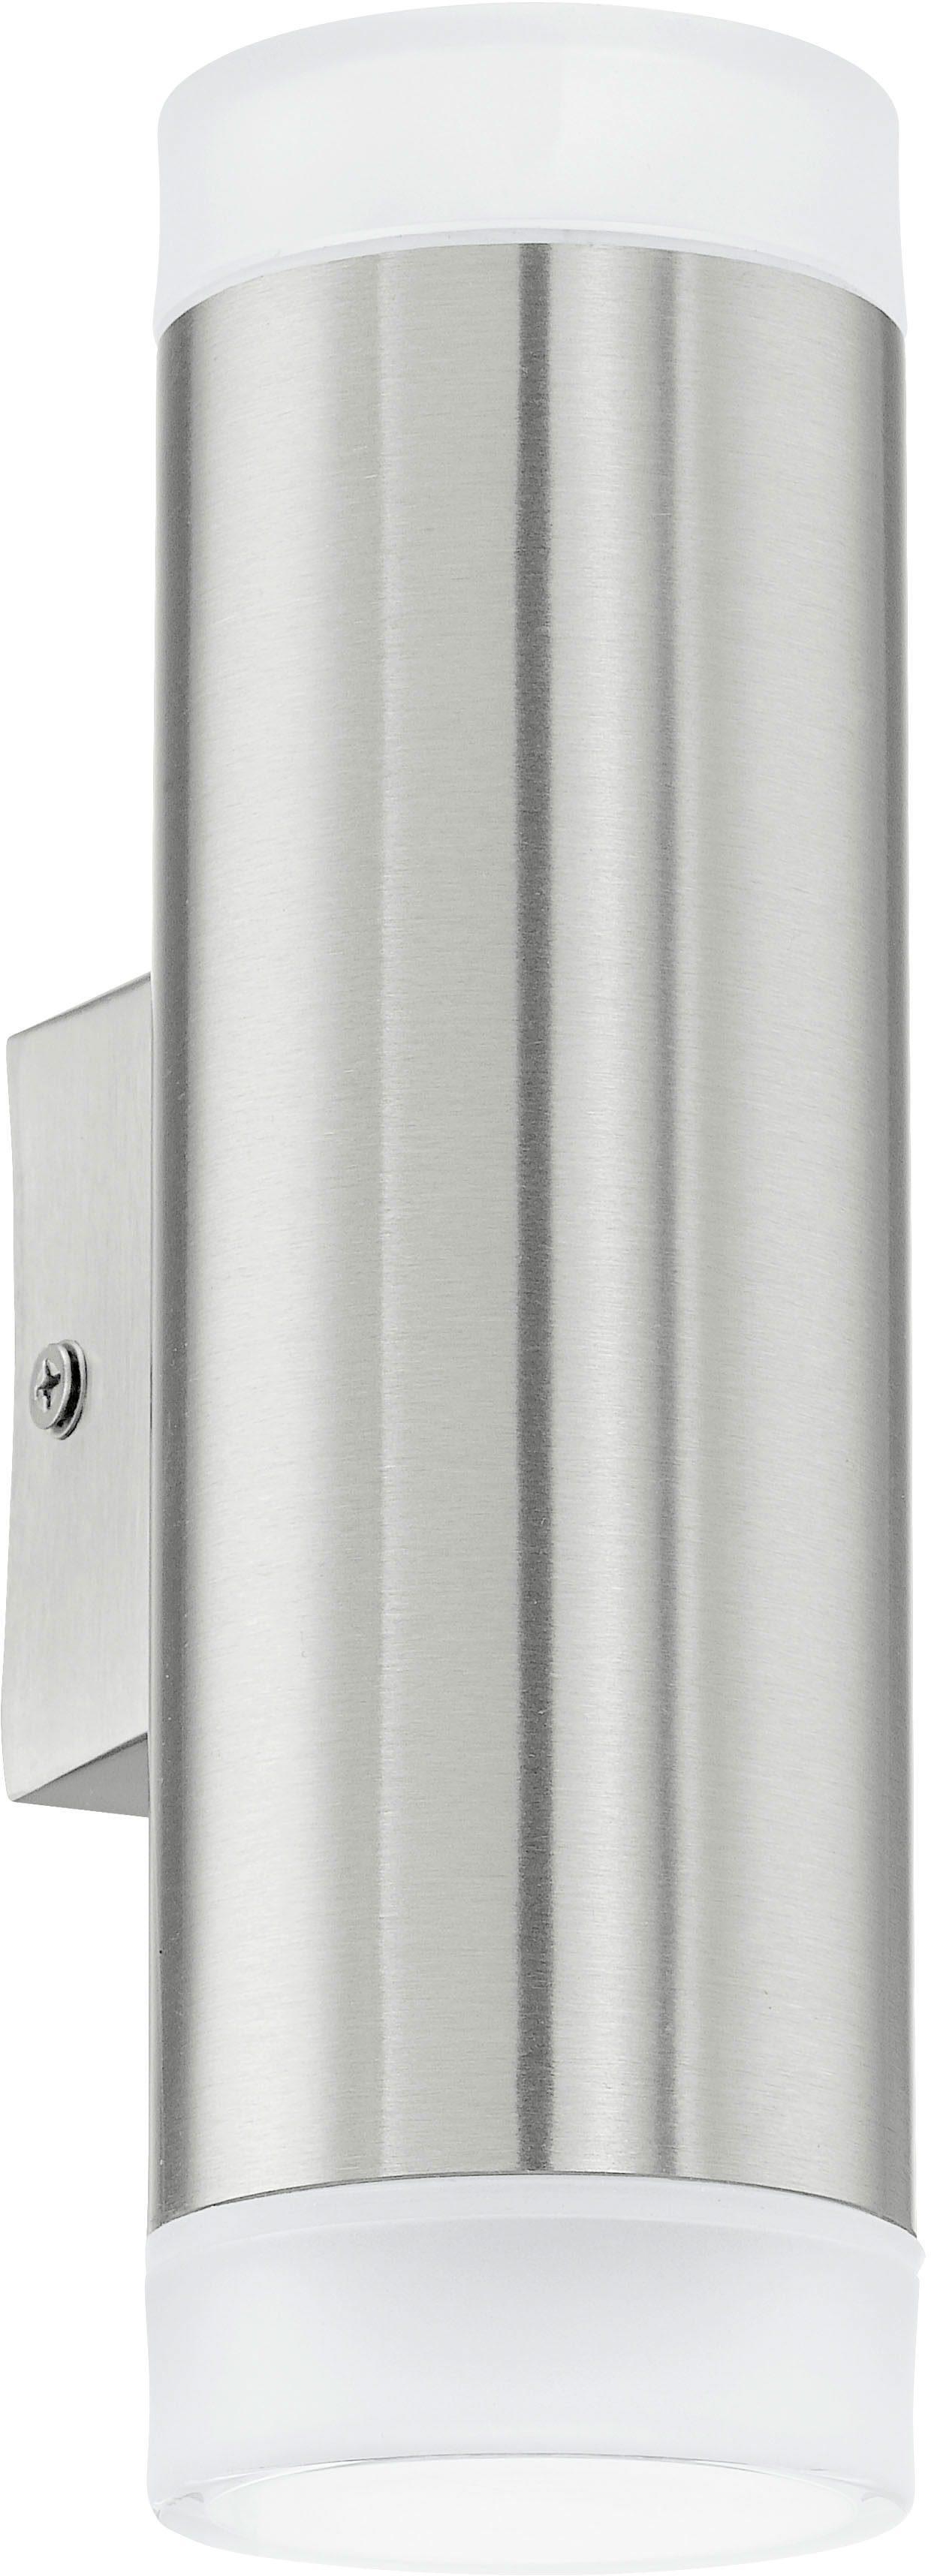 EGLO LED Außen-Wandleuchte »RIGA-LED«, 2-flammig